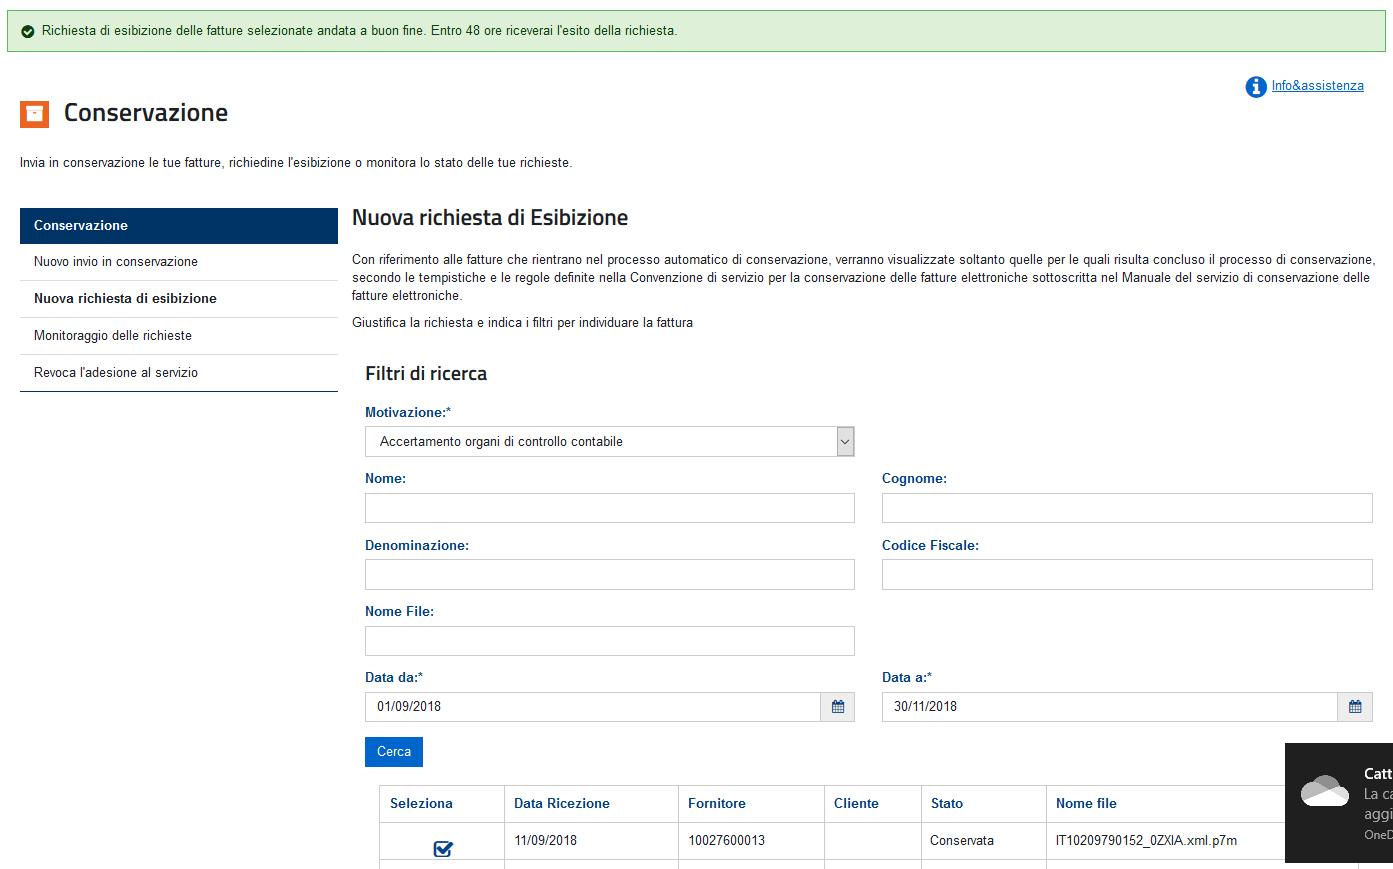 C:UserslucaAppDataLocalMicrosoftWindowsINetCacheContent.WordRichiesta a buon fine.png